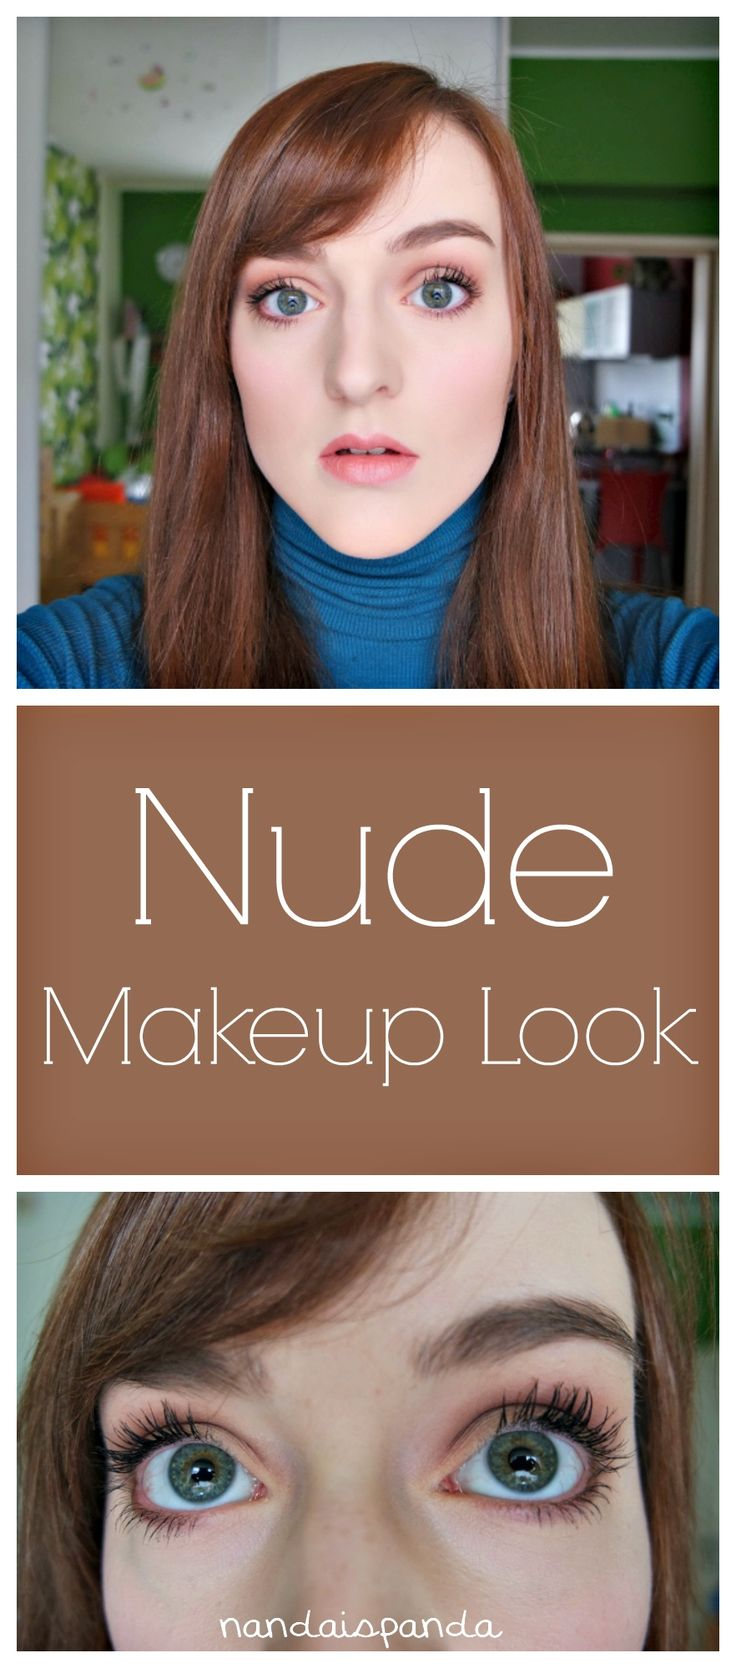 nude, makeup, makeup look, inspired, inspiration, cosmetics, budget, affordable, drugstore, themed, makeup idea, makeup tutorial, natural look